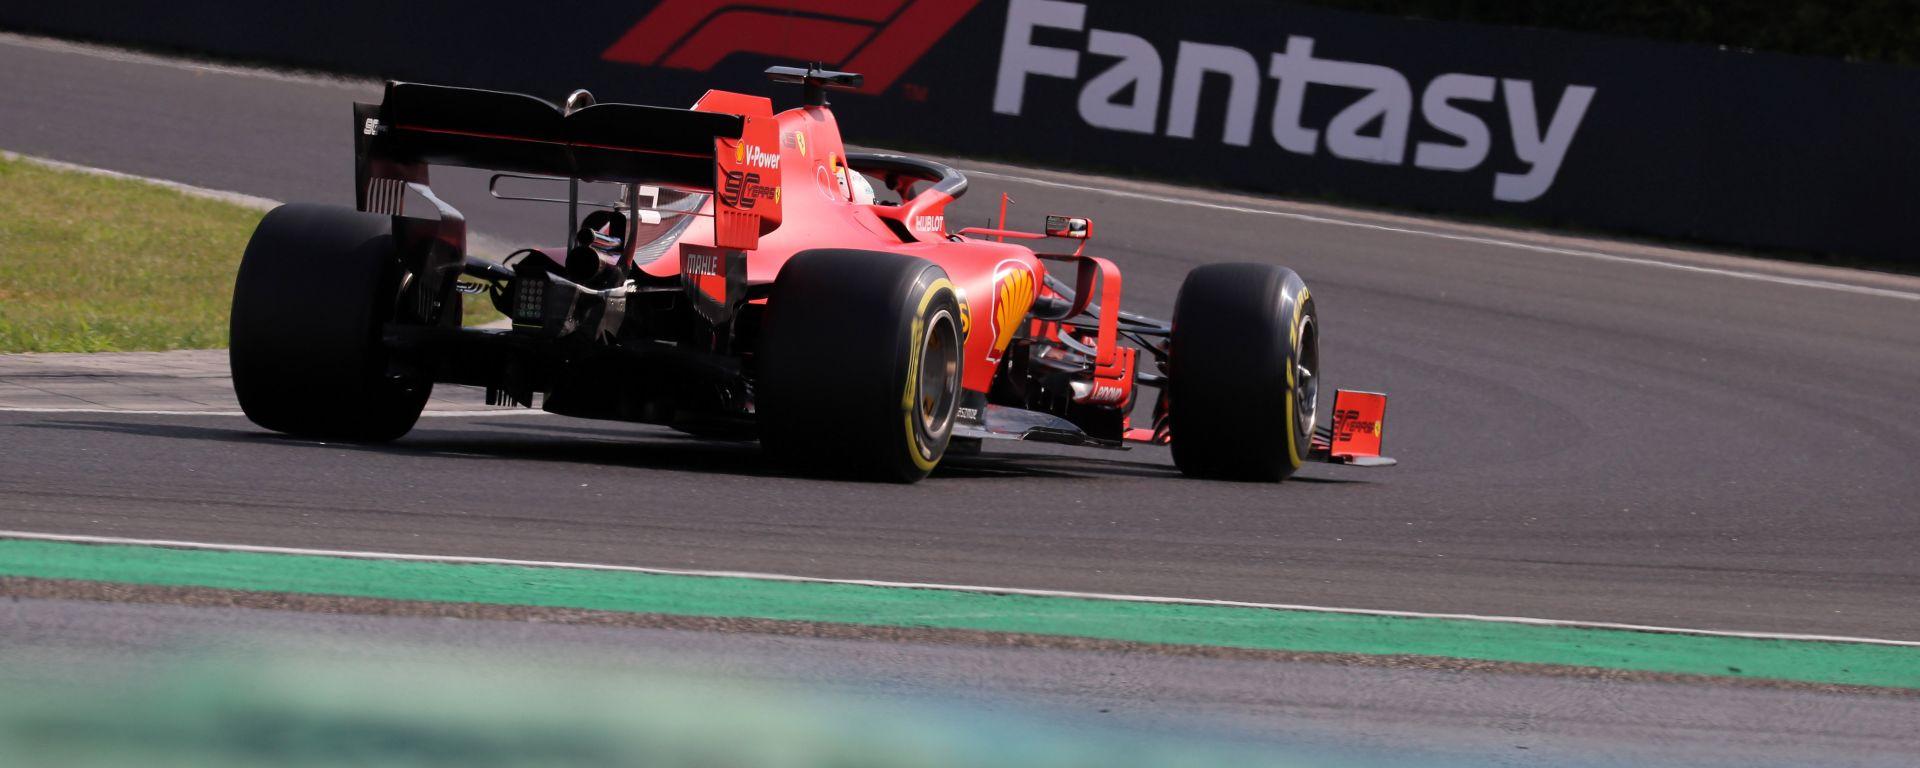 F1 GP Ungheria 2019, Budapest: Sebastian Vettel (Ferrari) in curva-13